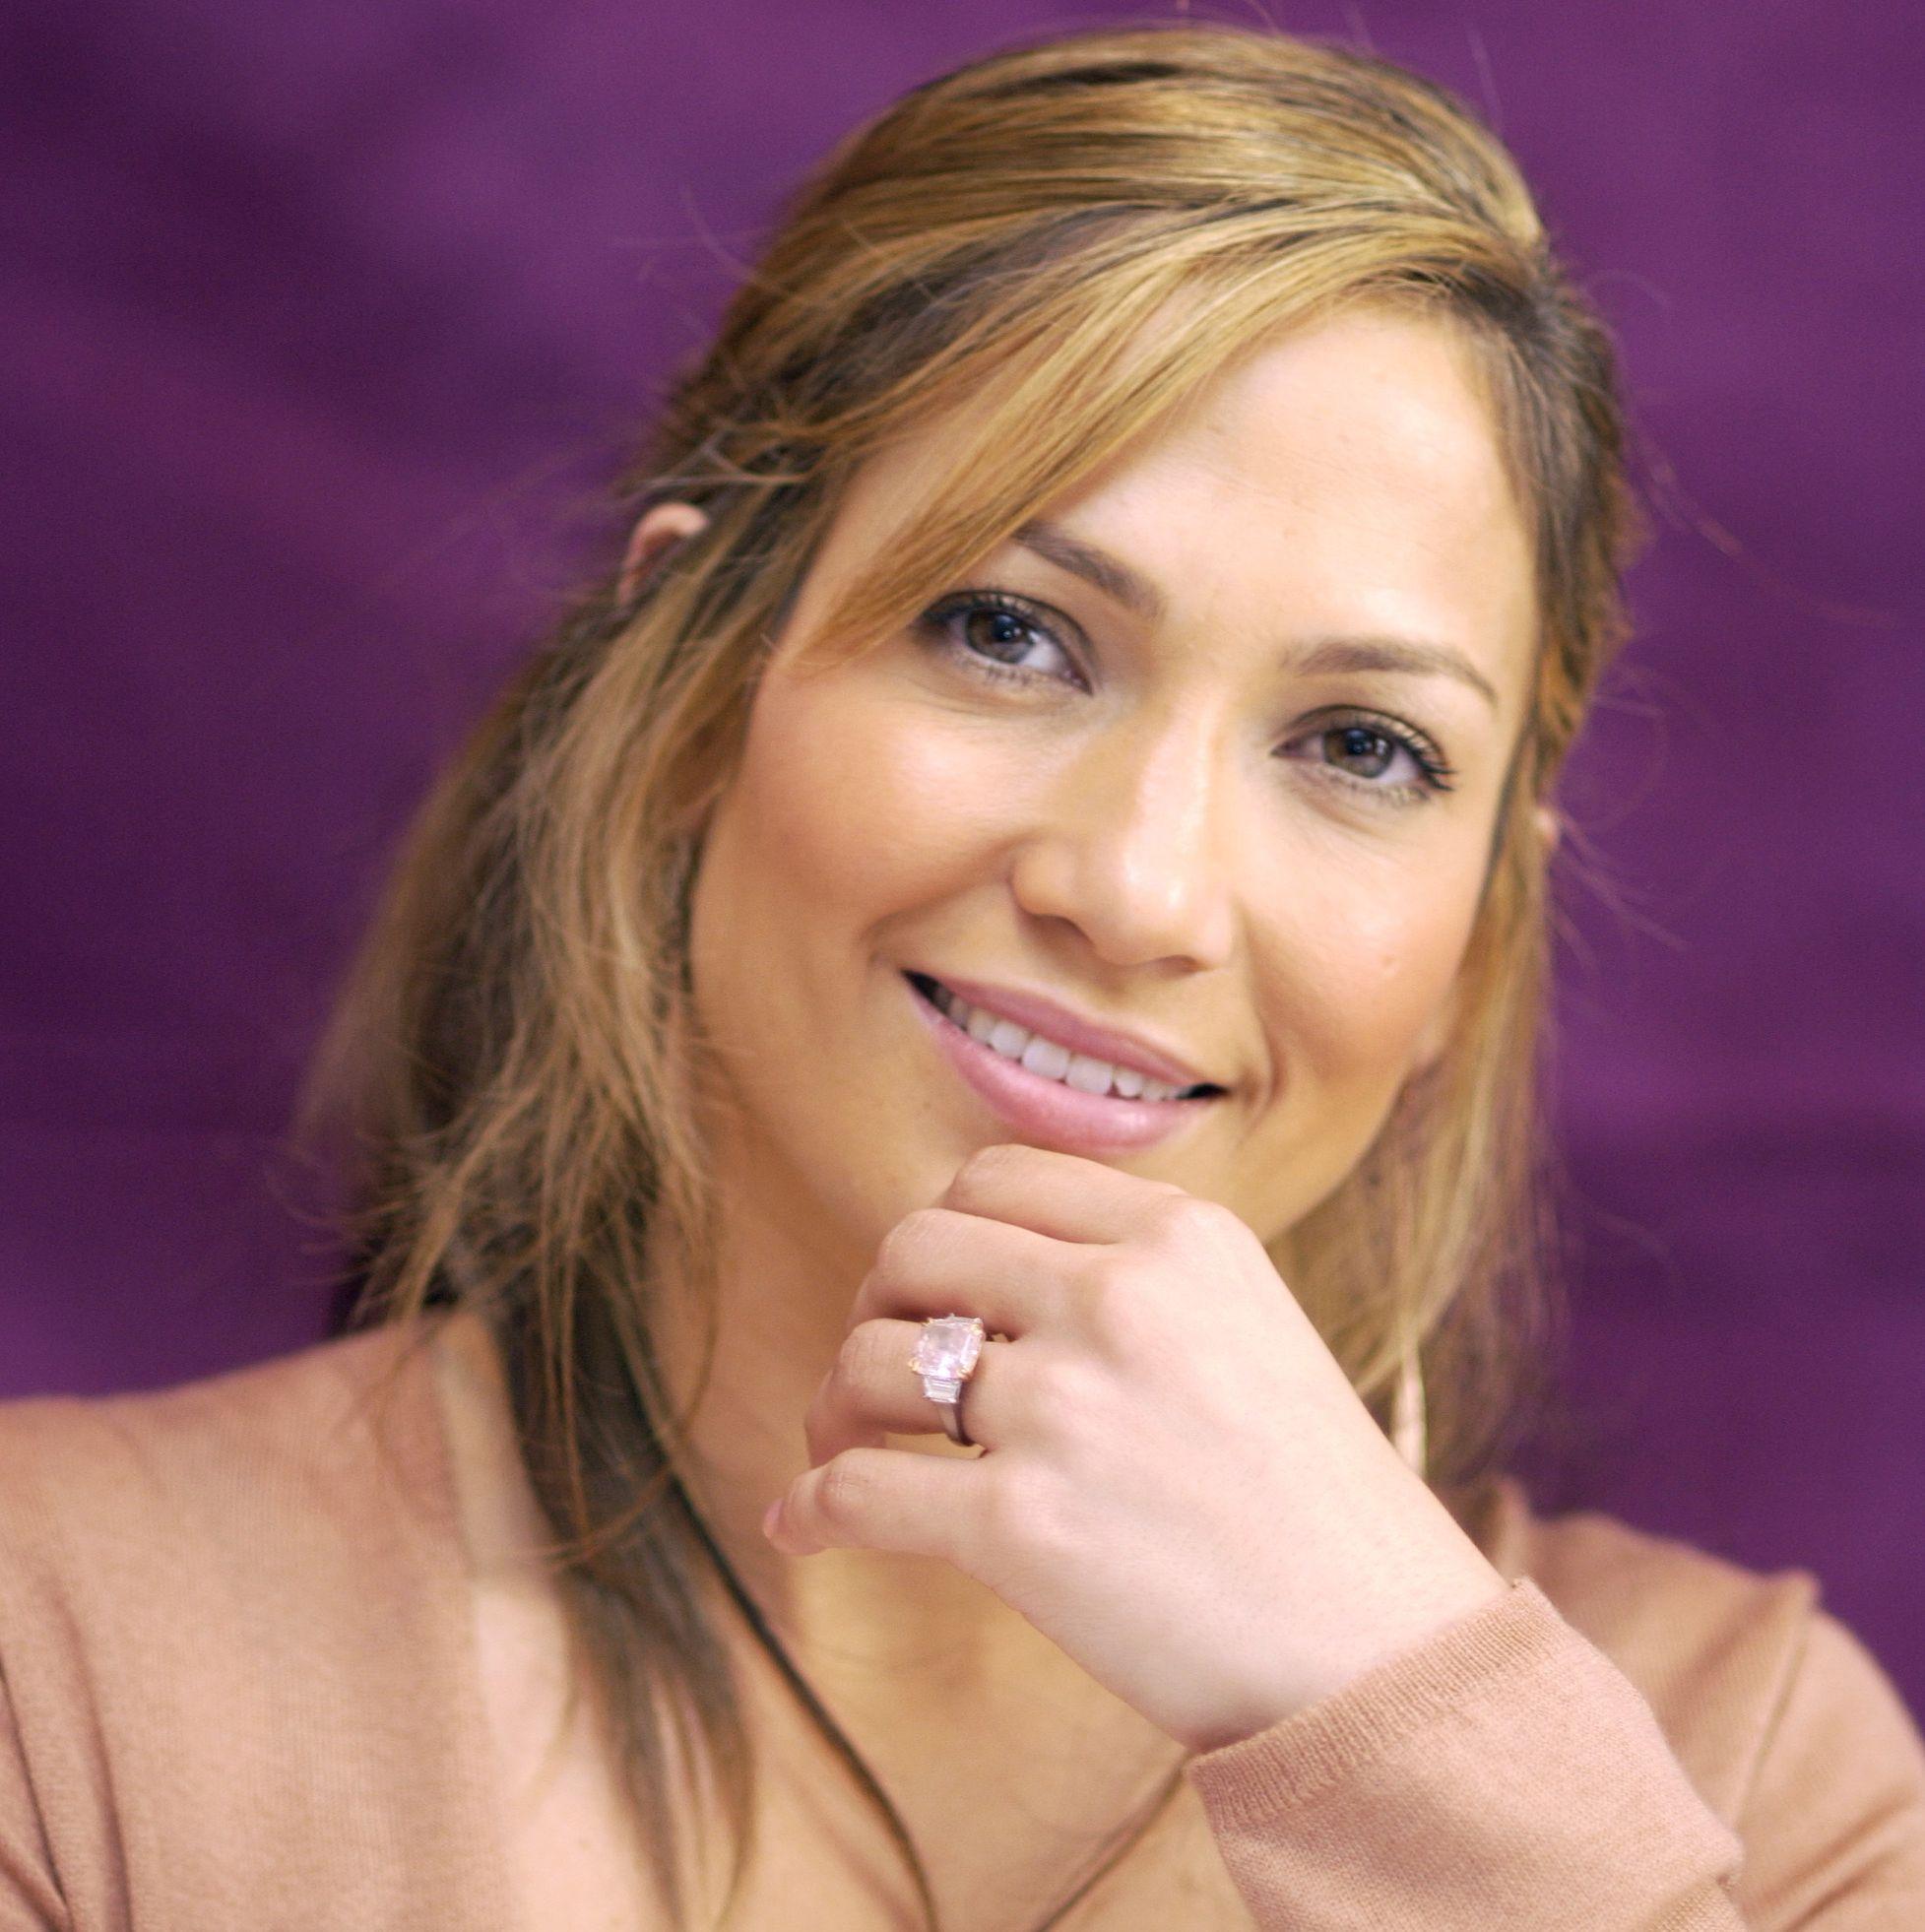 Jennifer Lopez's Pink Diamond Made Her an Engagement Ring Influencer